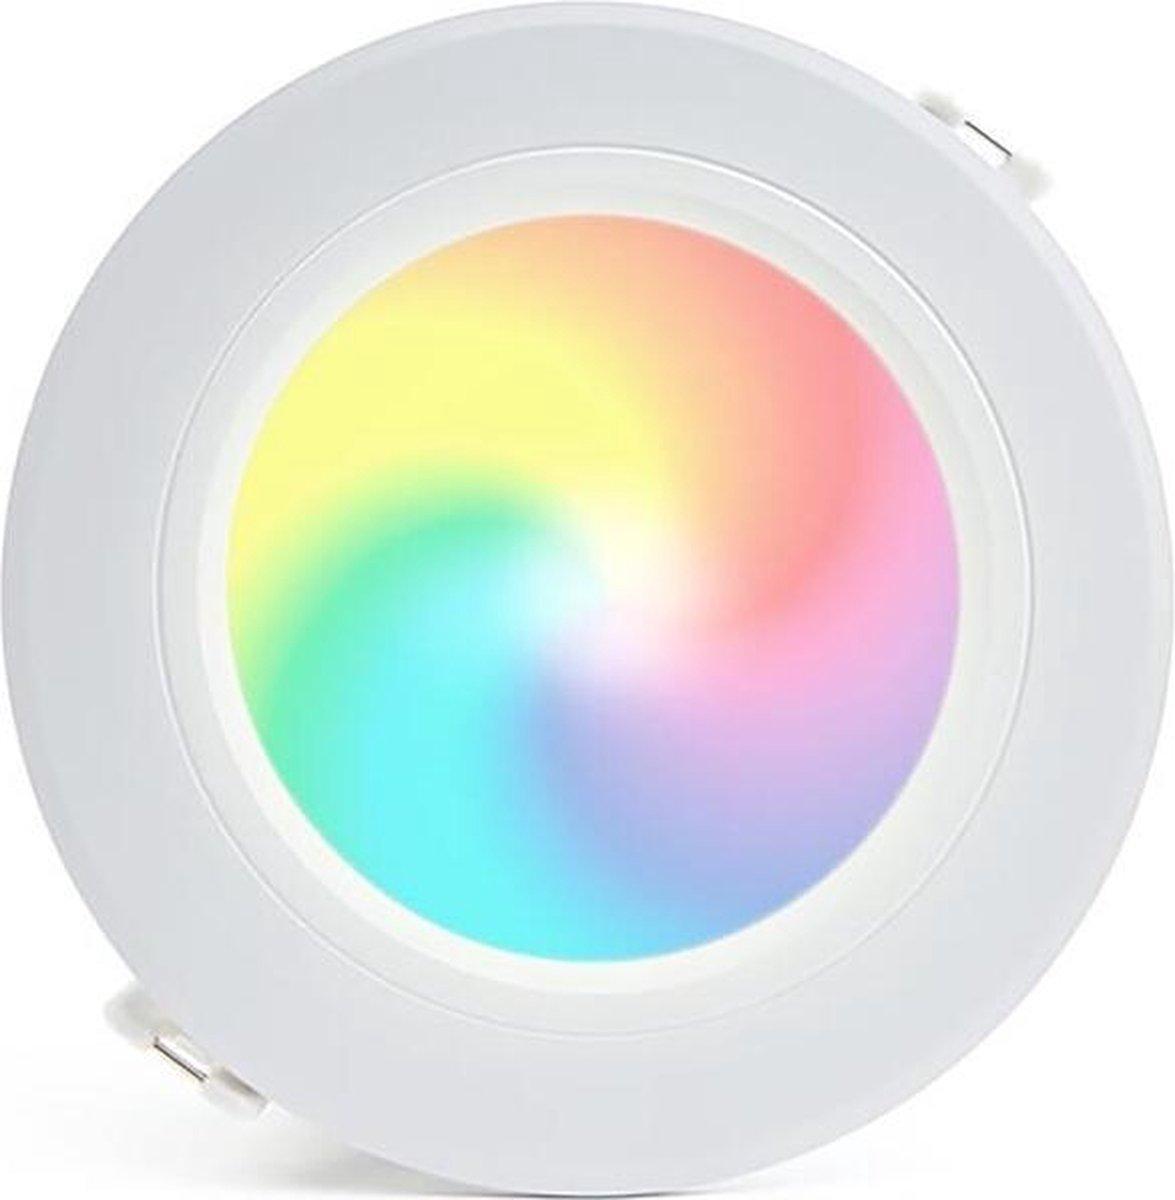 Mi-Light - LED Downlight - Smart LED - 6W - RGB+CCT - Aanpasbare Kleur - Dimbaar - Inbouw Rond - Mat Wit - Aluminium - Ø120mm